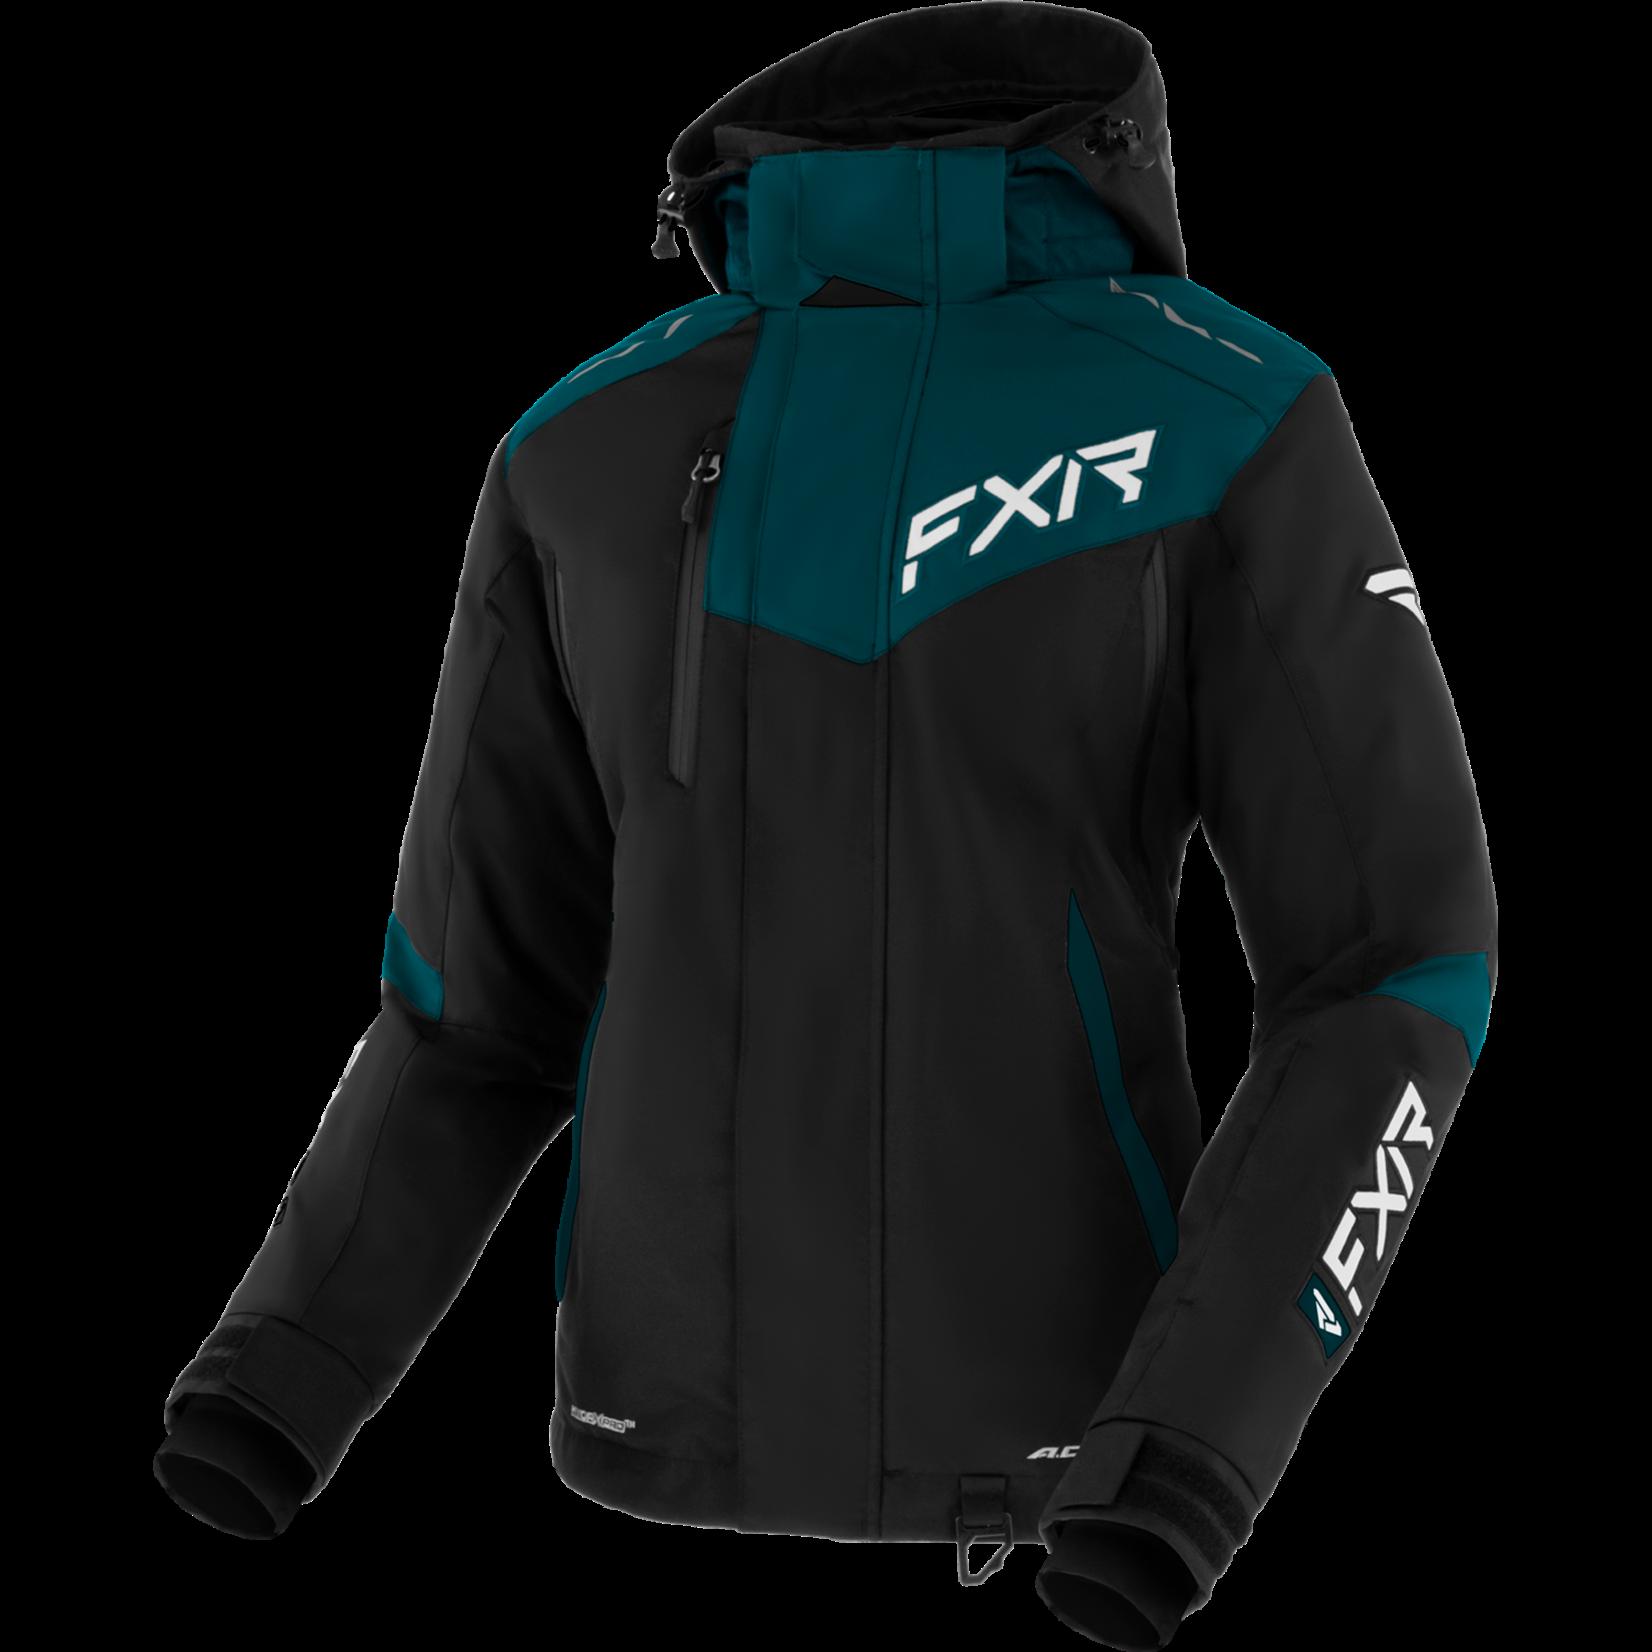 FXR W Edge Jacket - BLK/OCEAN/WHT - 8